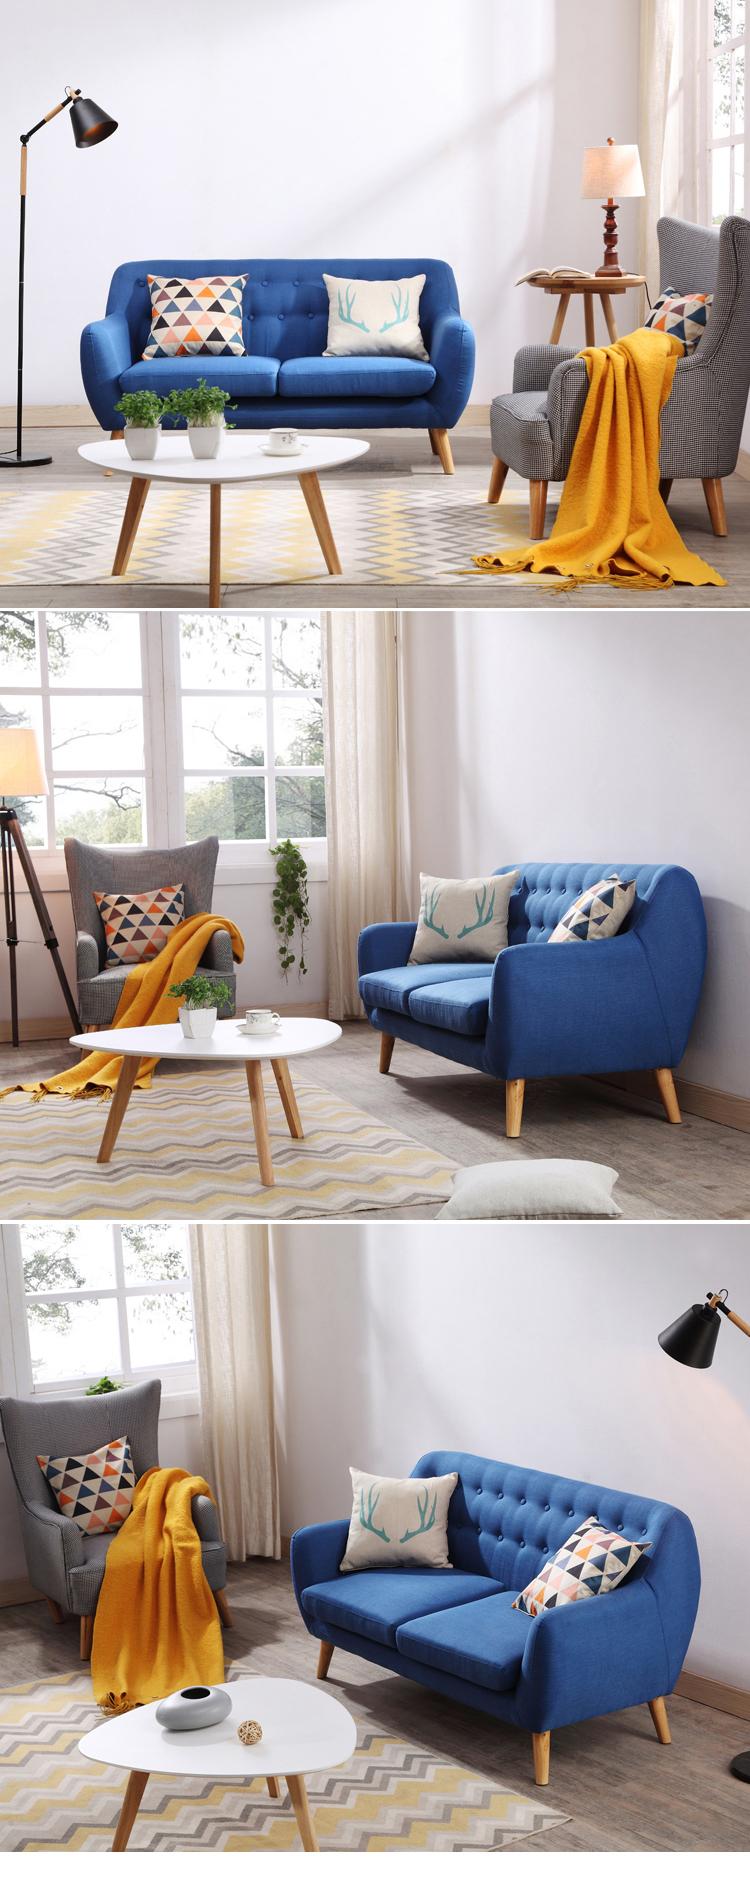 Low price latest design contemporary furniture living room sofa set